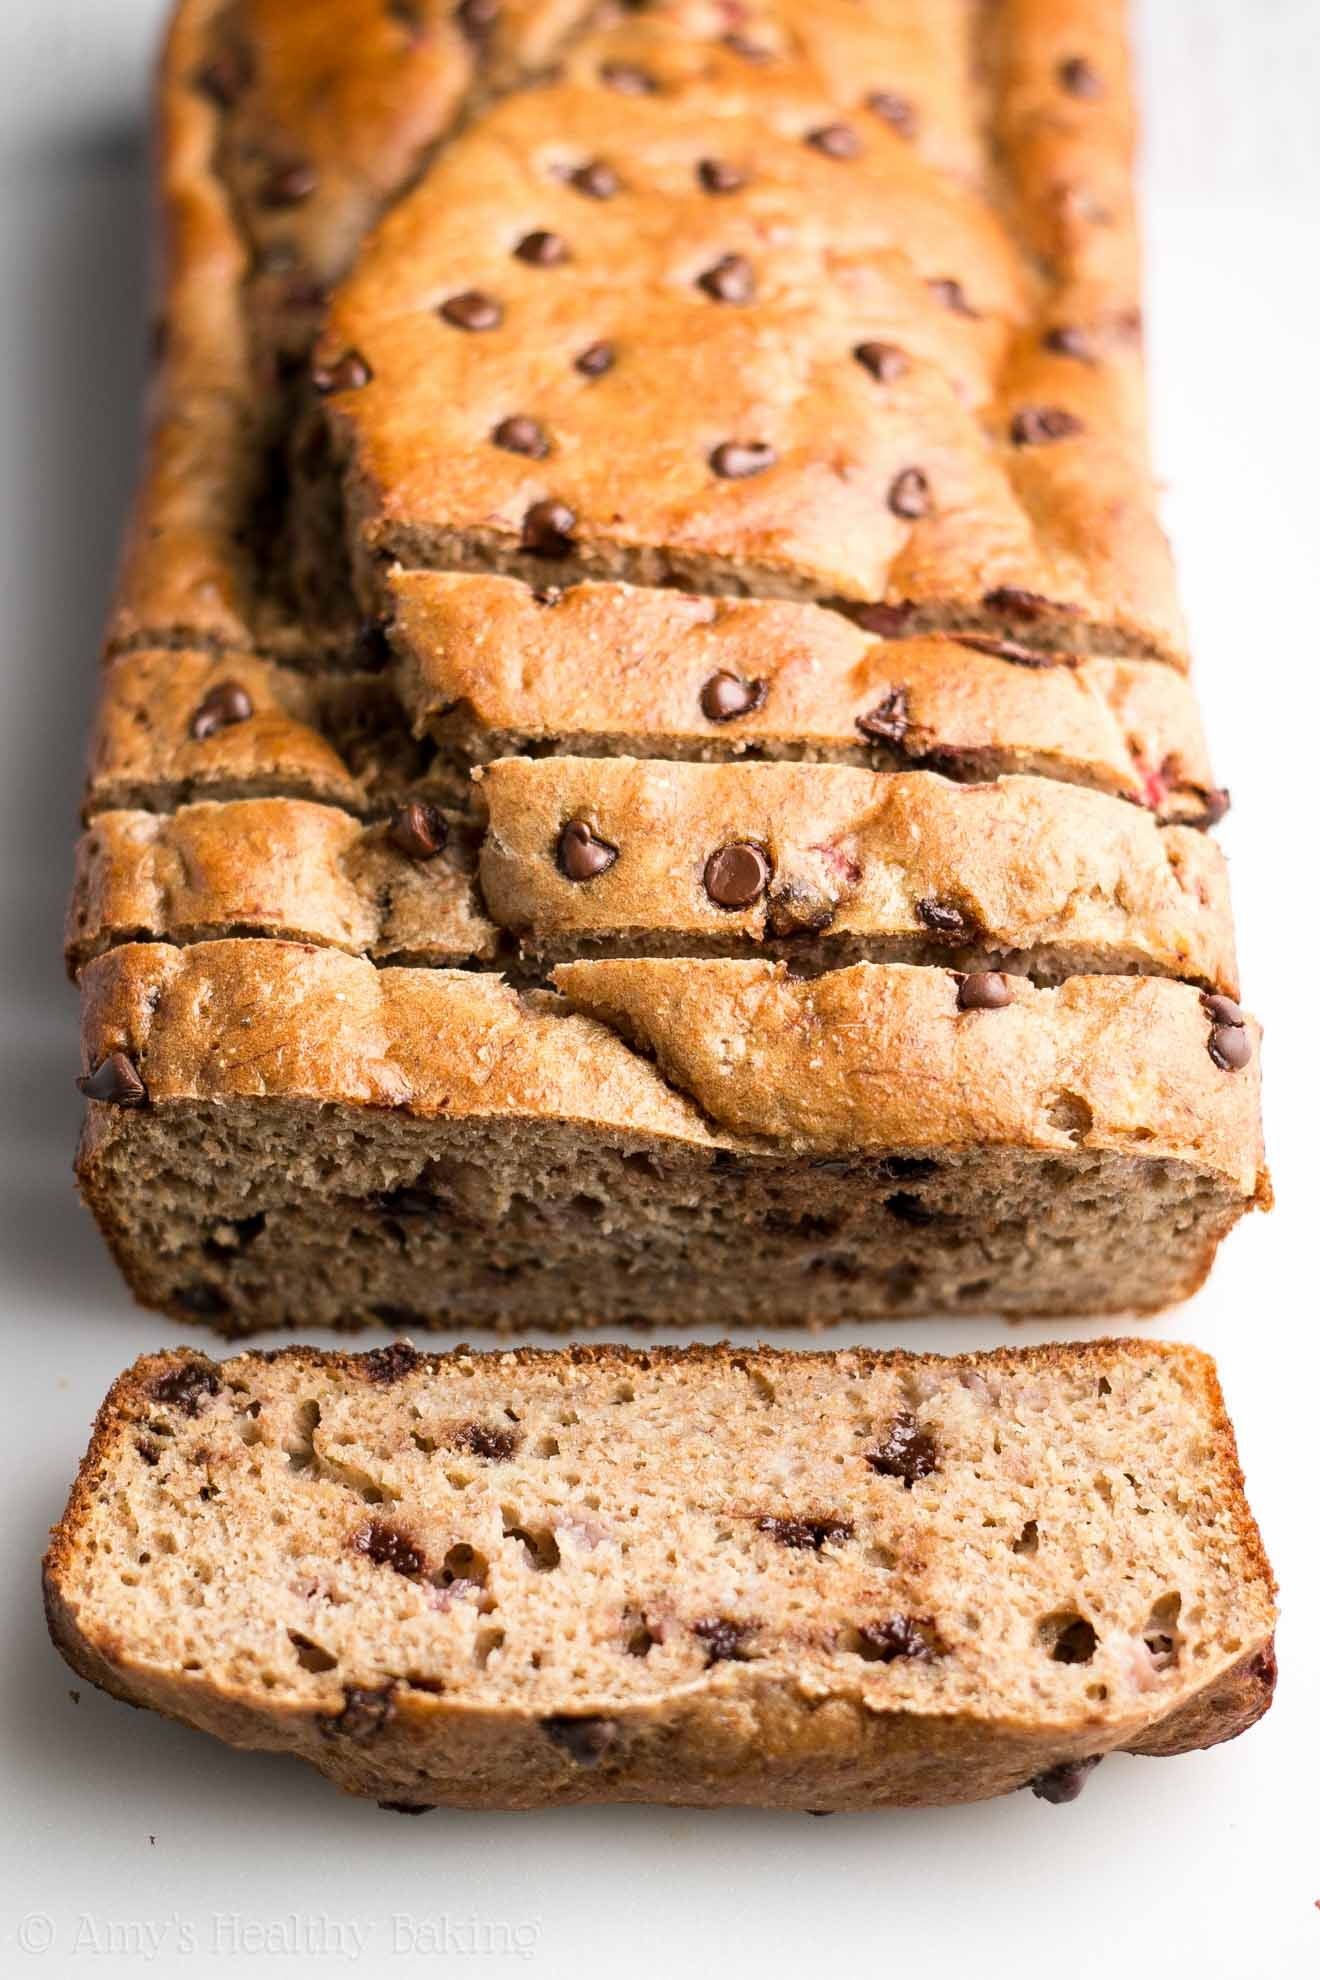 Strawberry Chocolate Chip Banana Bread | Amy's Healthy Baking